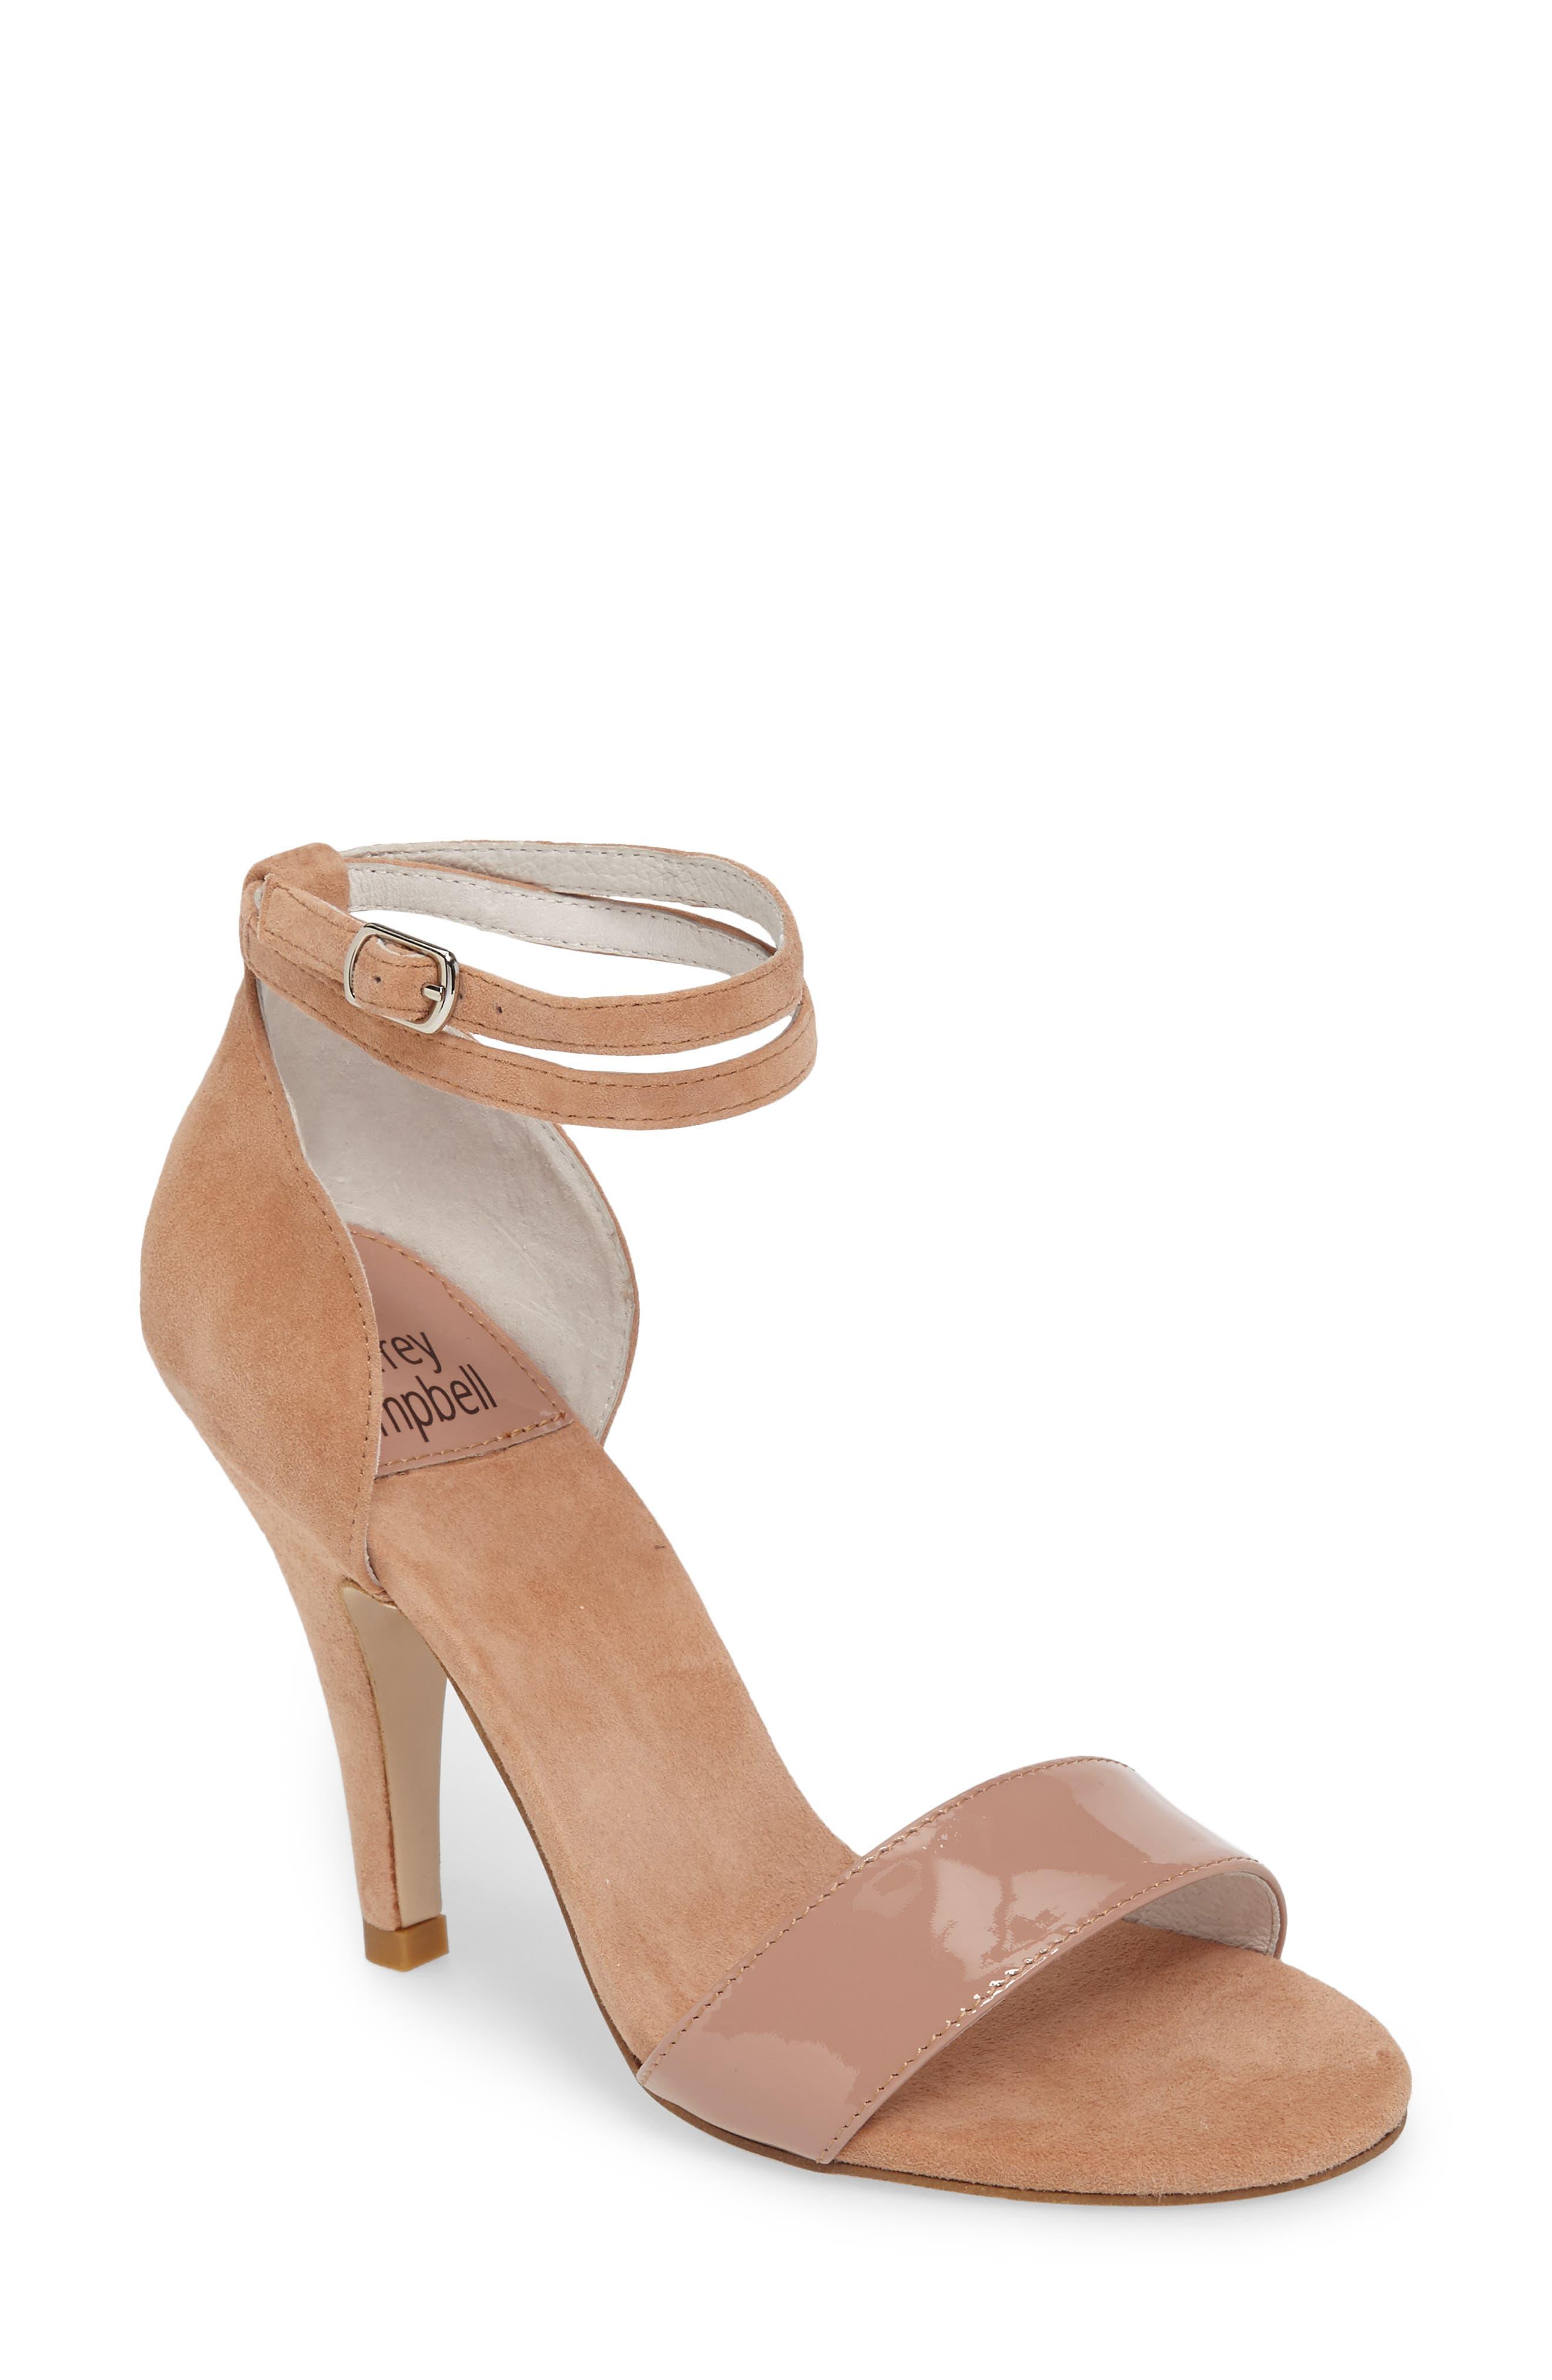 Alternate Image 1 Selected - Jeffrey Campbell Kristy Ankle Strap Sandal (Women)